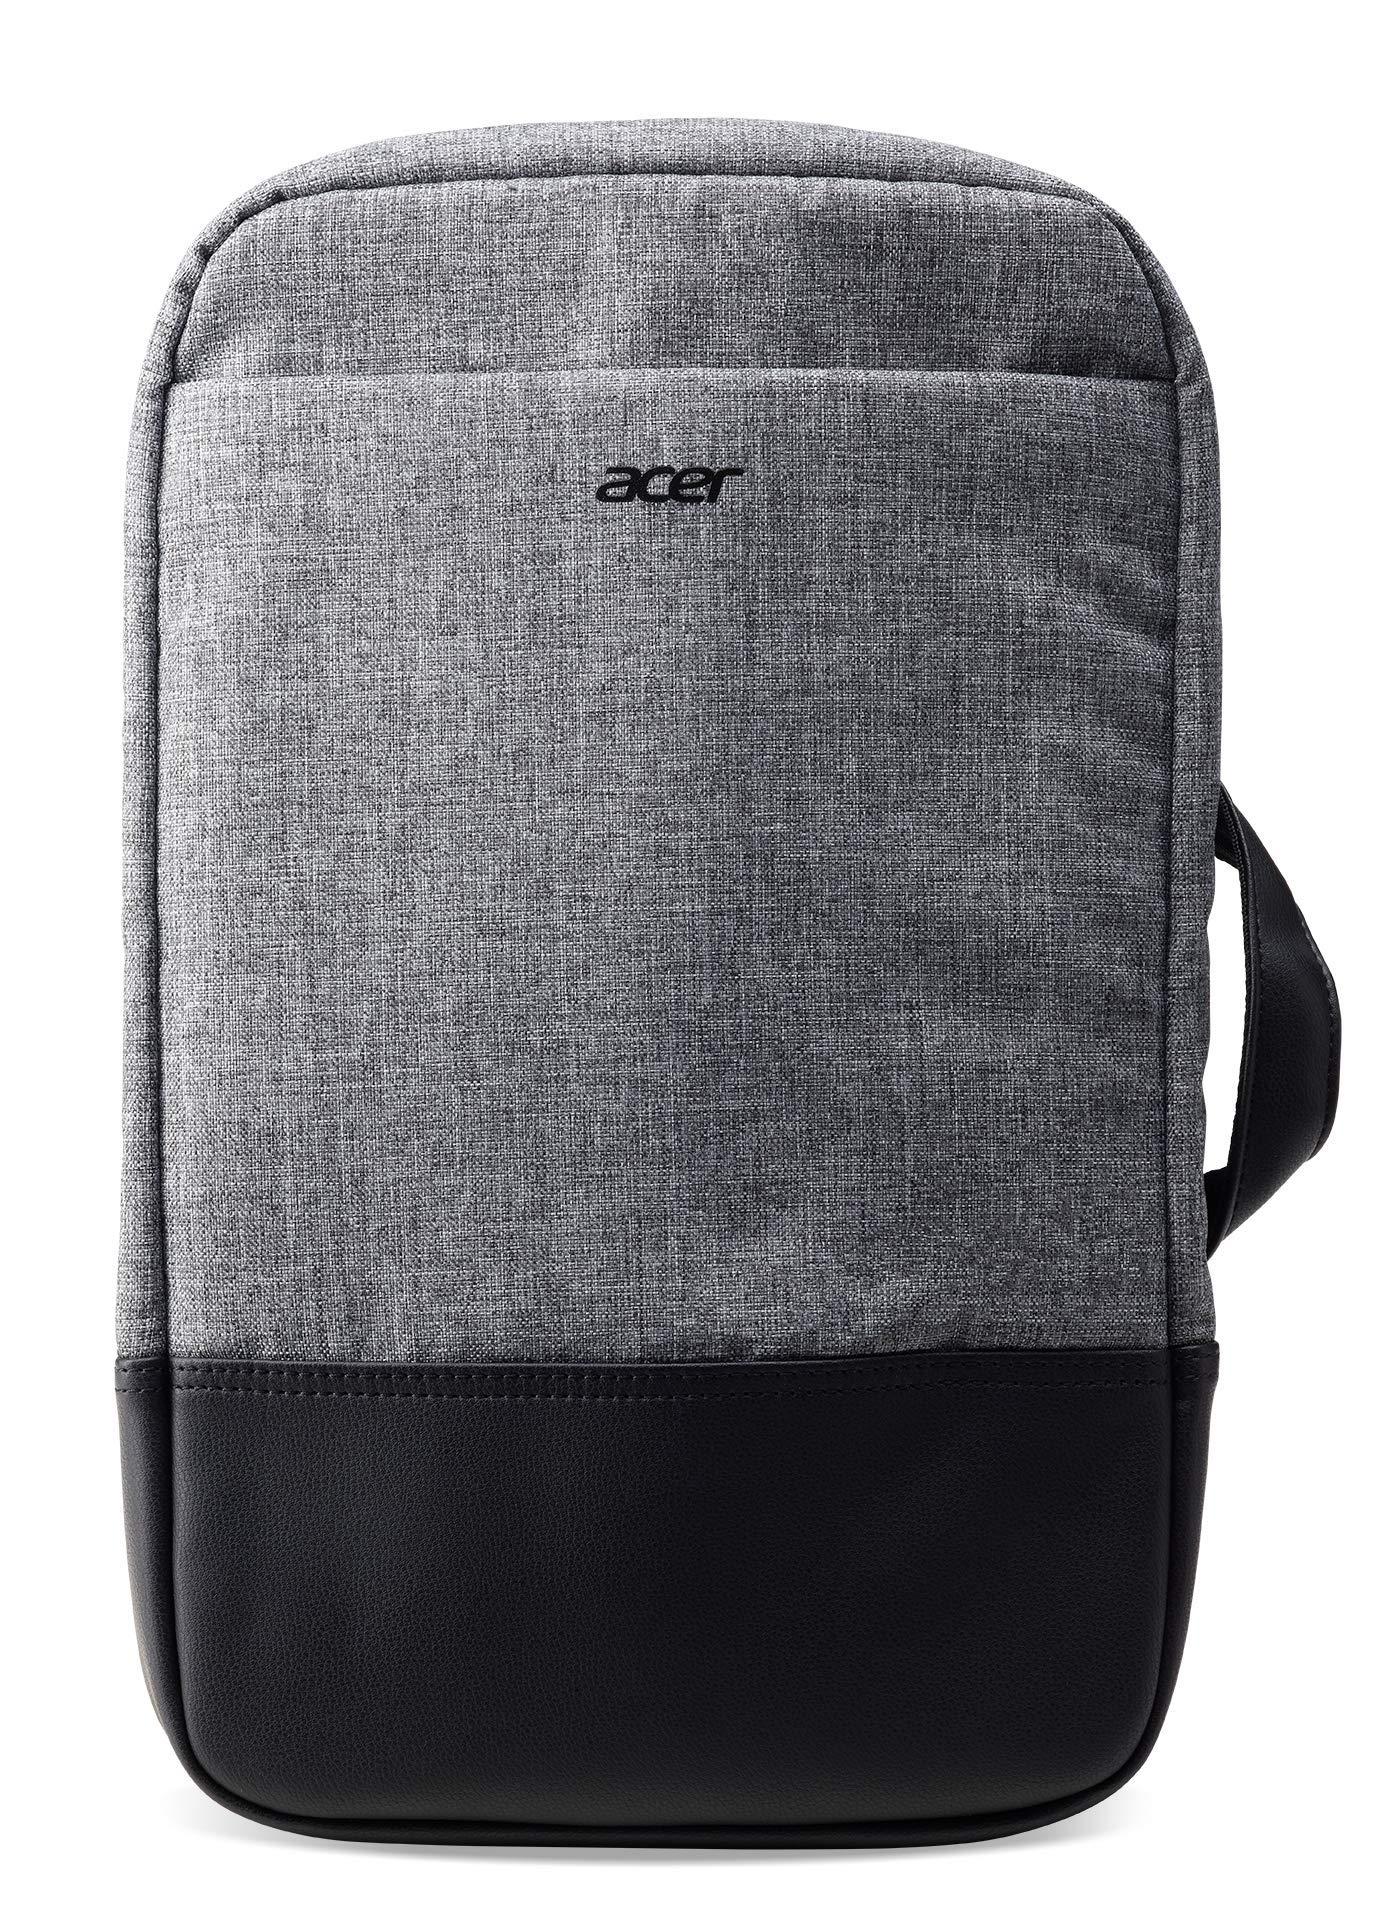 "Acer Slim 3-in-1 Backpack for 14"" Notebooks"